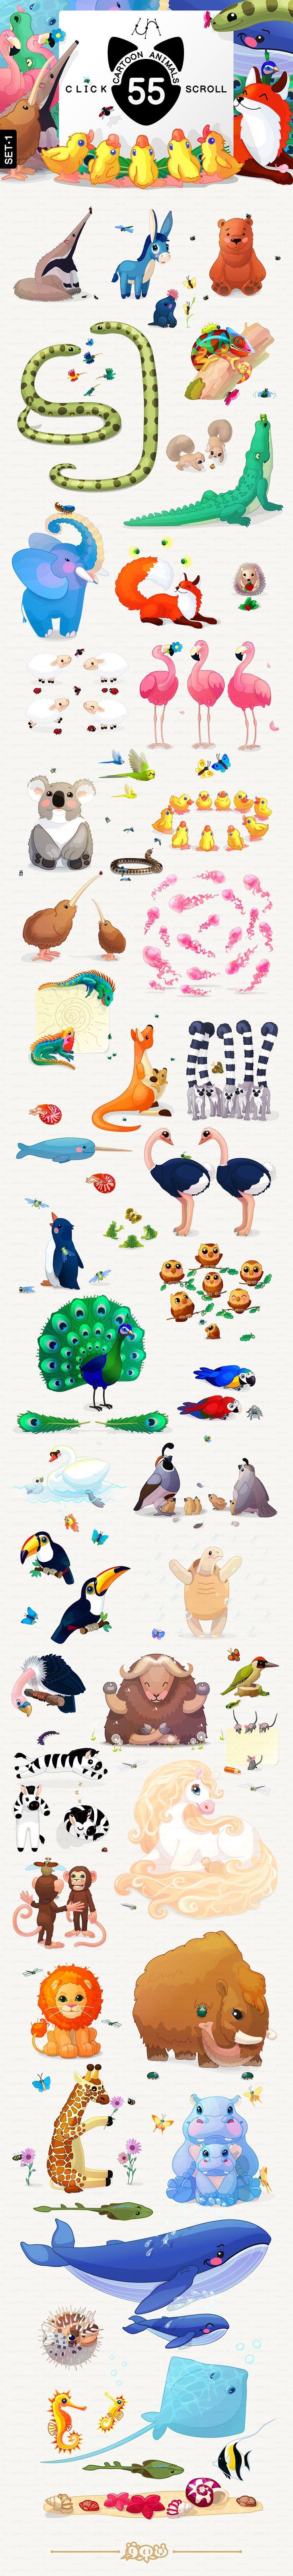 ♥️ 220 species of animals & plants by WINDmade on @creativemarket